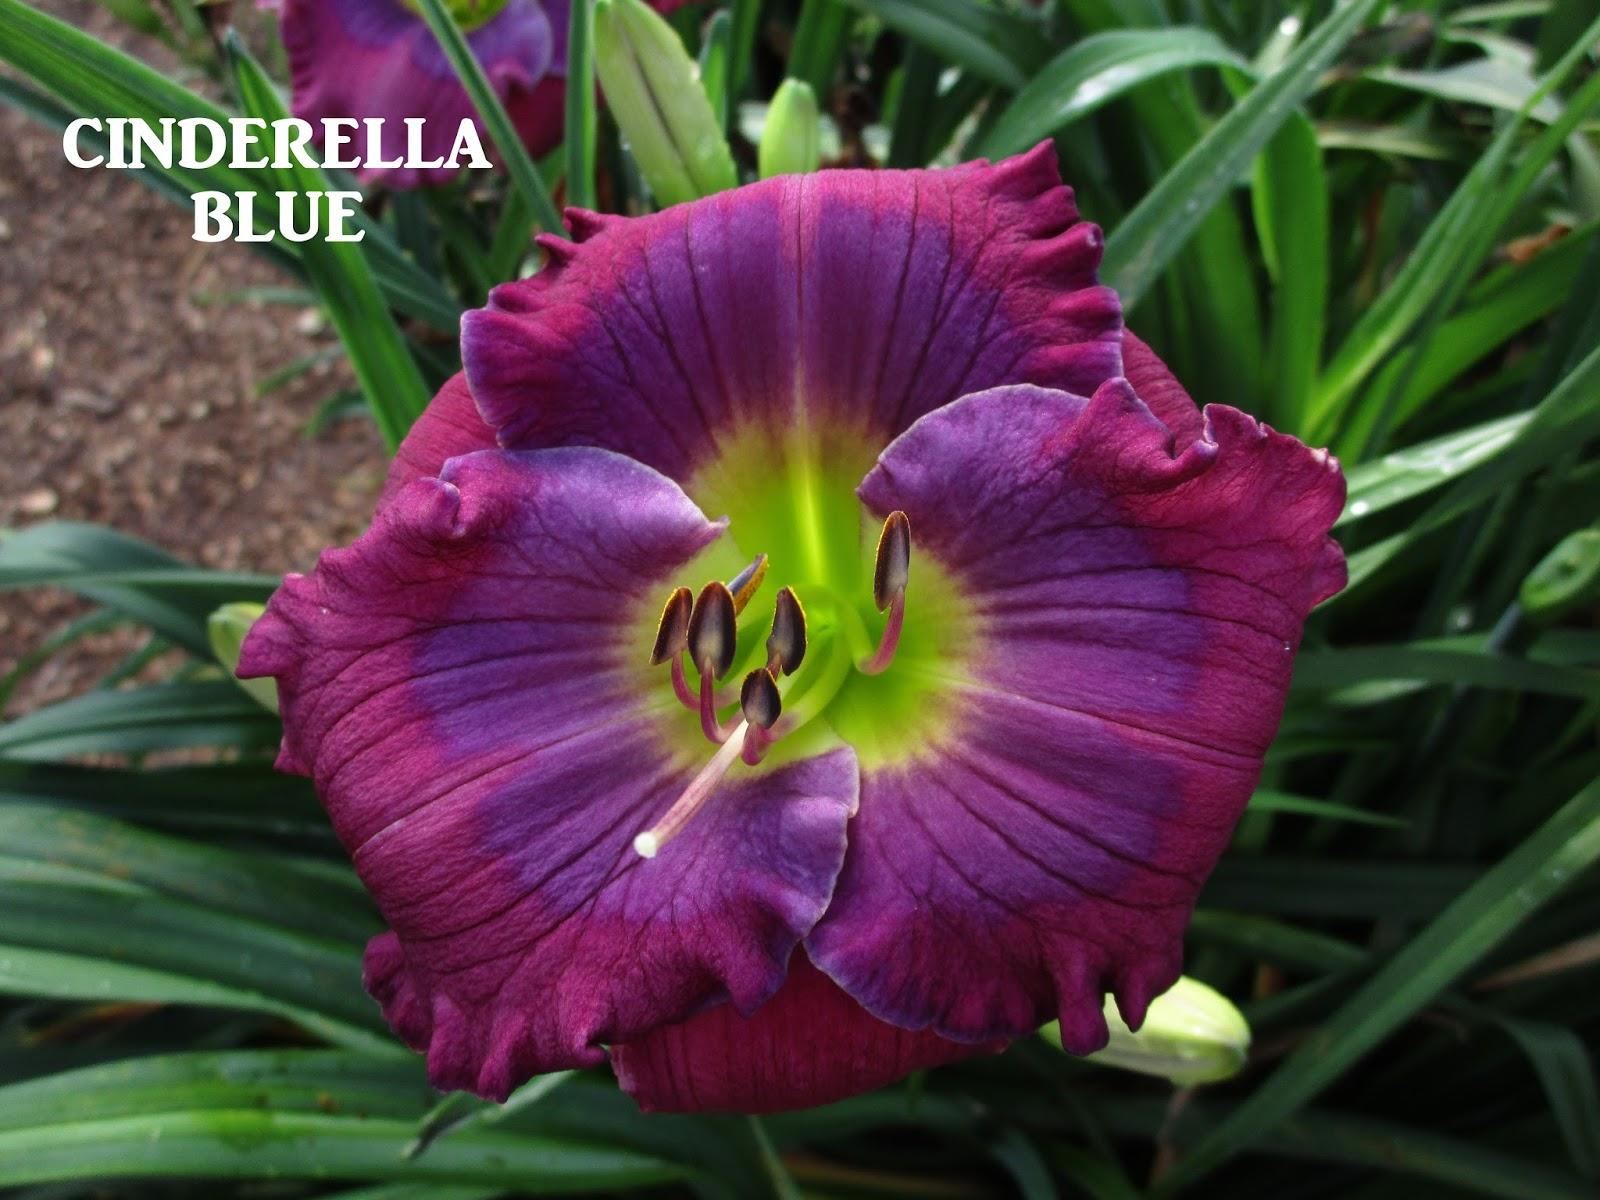 Bills daylily corner 2017 introductions lavender blue baby x tet crystal blue persuasion x blue beat seedling 3 355 sev tet em 28 tall 4 way branching 17 buds 575 flower izmirmasajfo